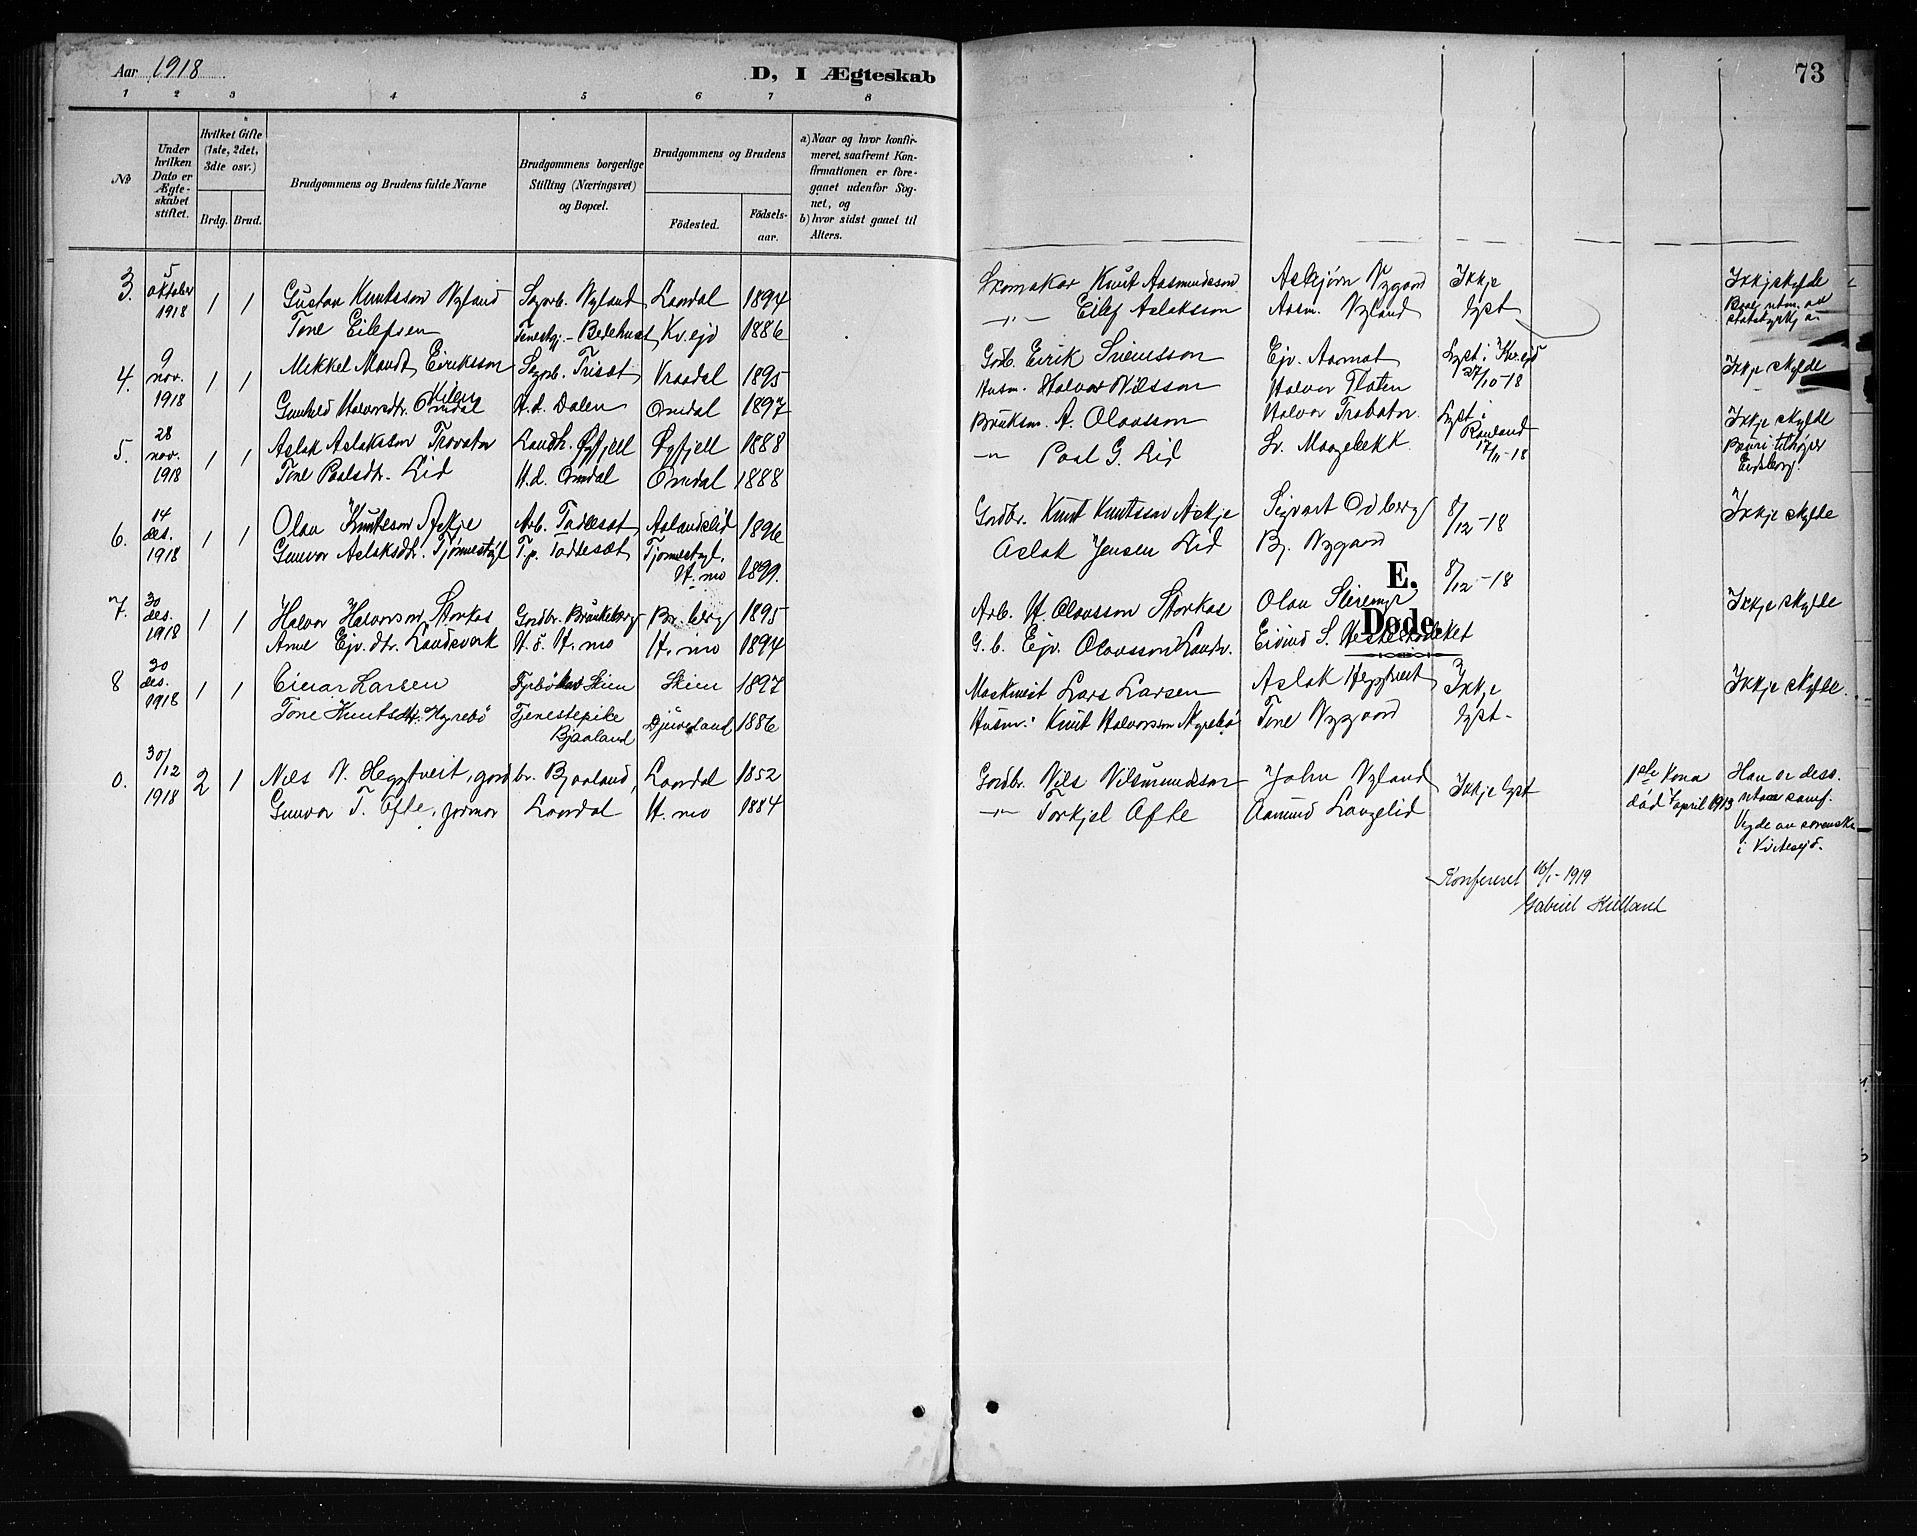 SAKO, Lårdal kirkebøker, G/Ga/L0003: Klokkerbok nr. I 3, 1891-1918, s. 73